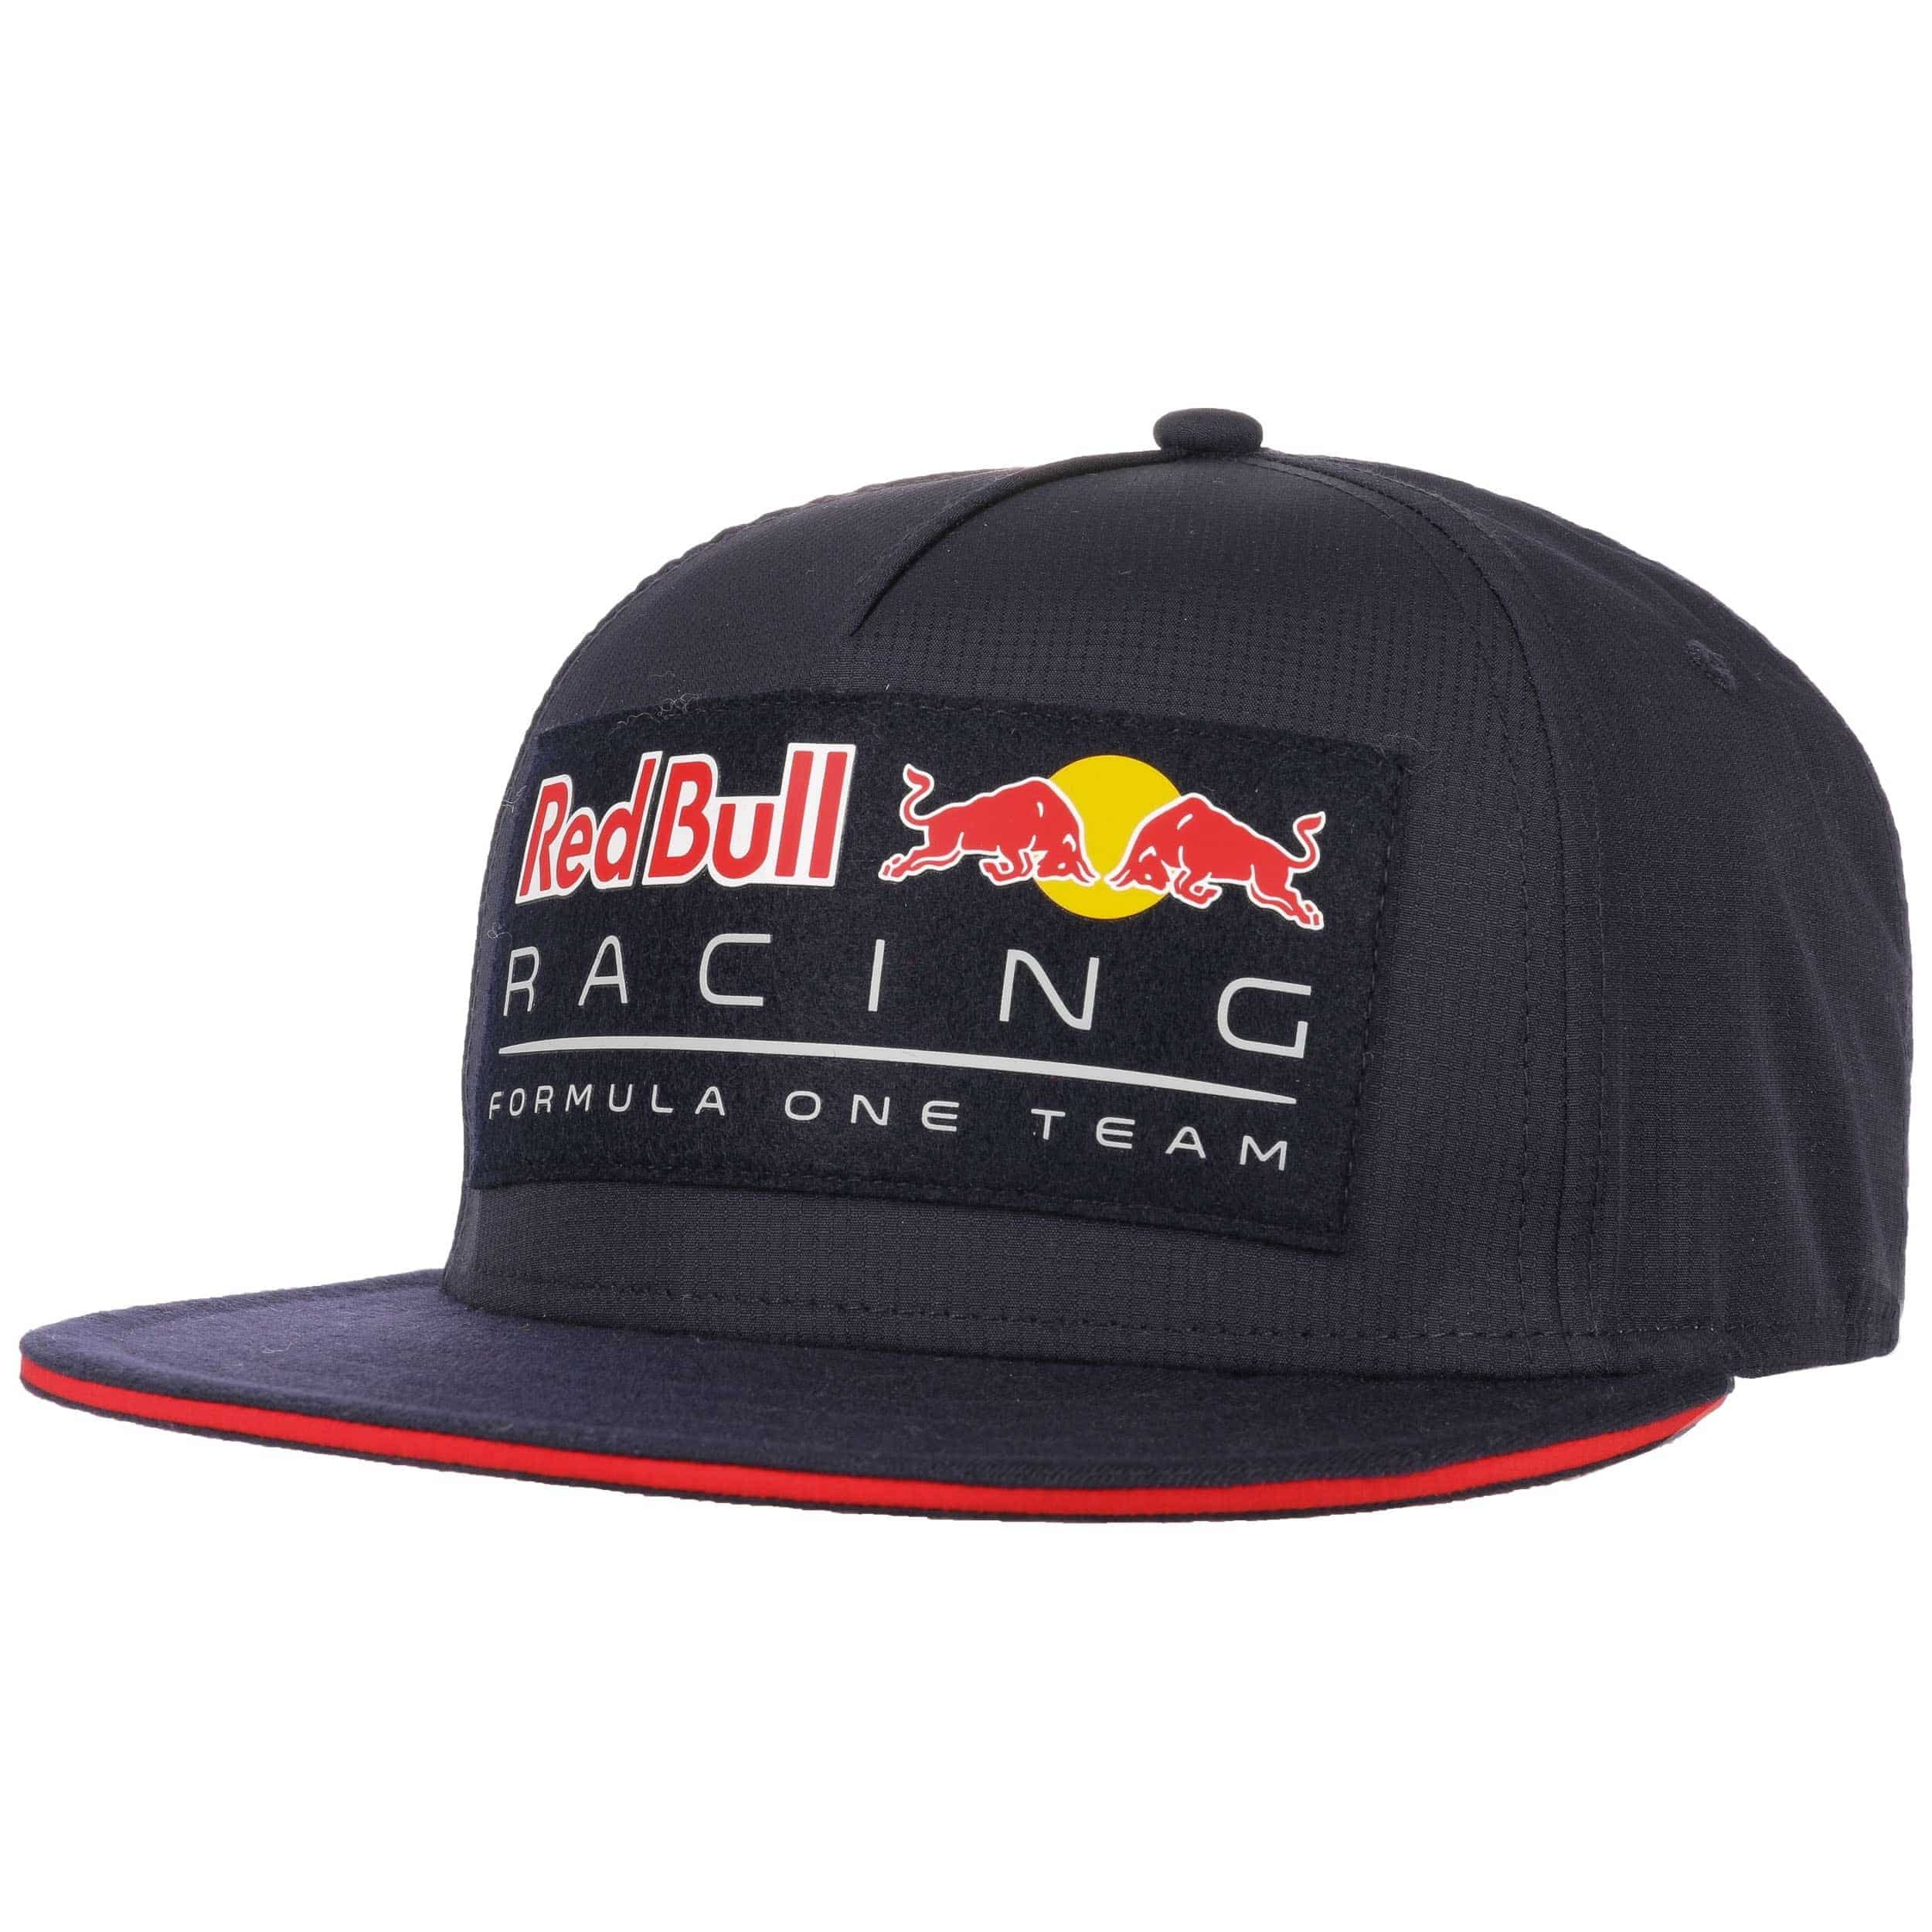 Red Bull Racing Cap by PUMA